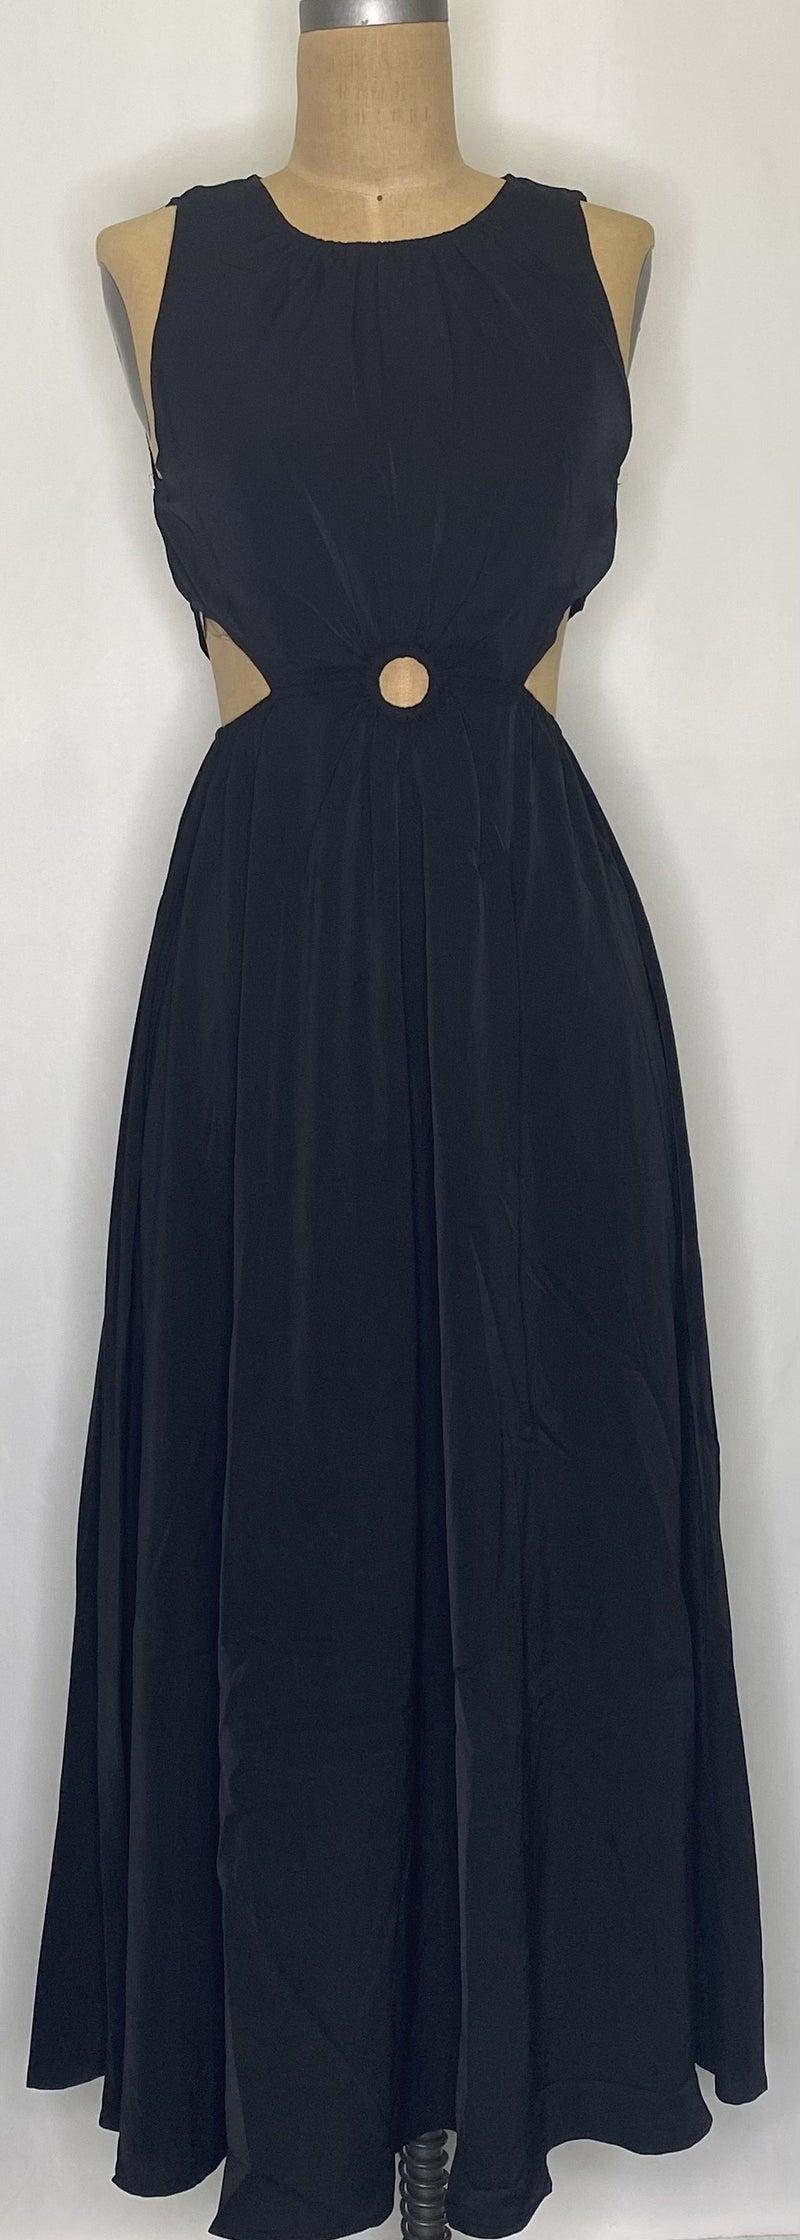 Quite Alright Dress